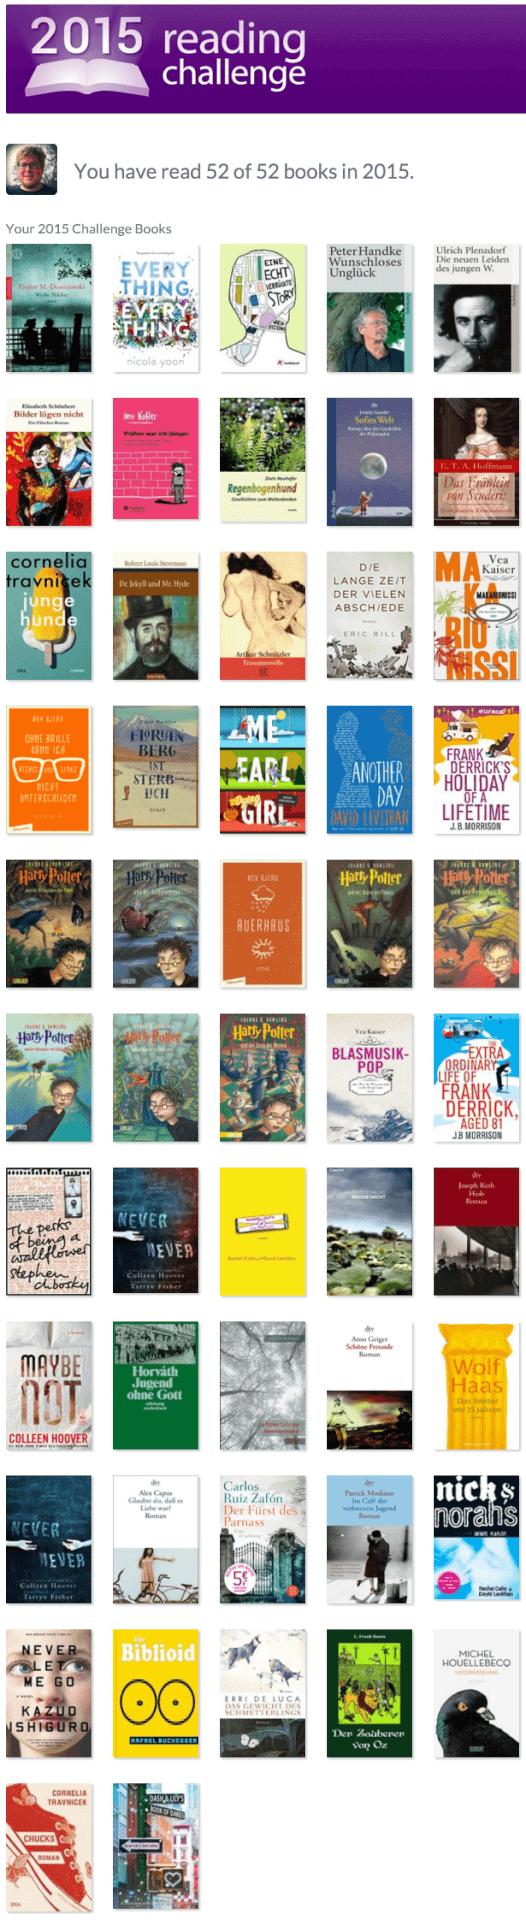 Goodreads52